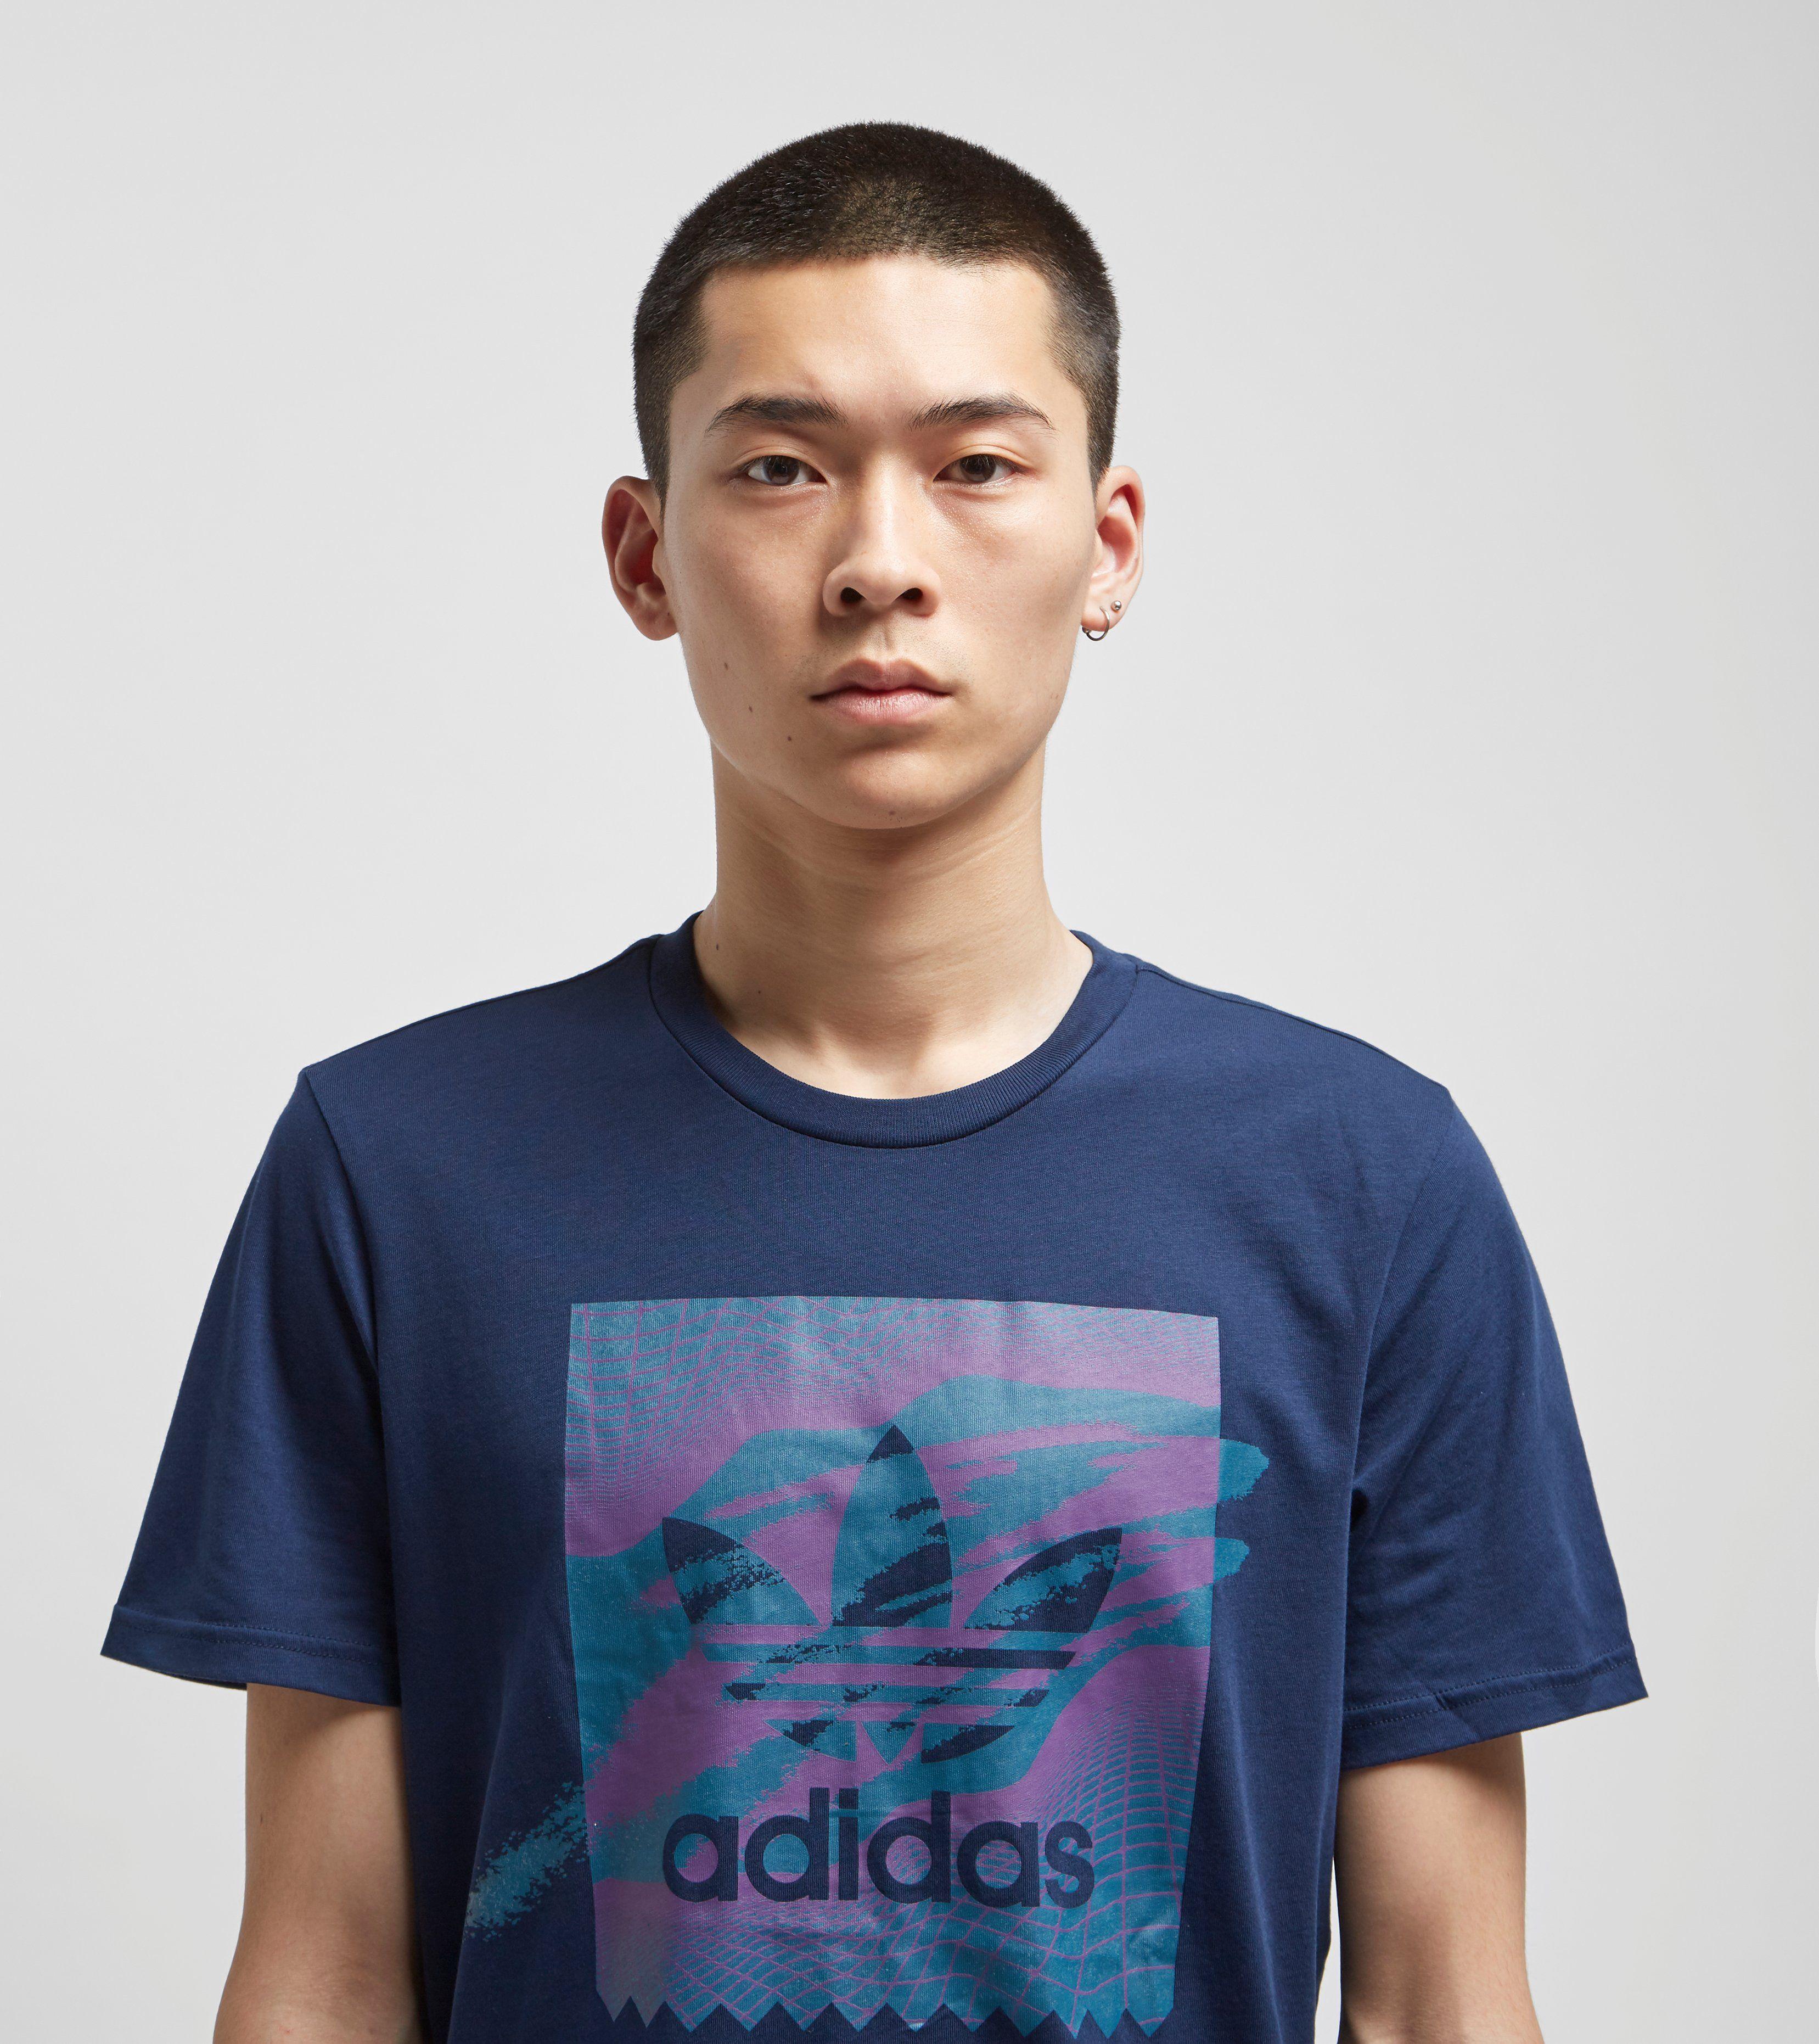 adidas Originals 90s Tennis Logo Short Sleeve T-Shirt